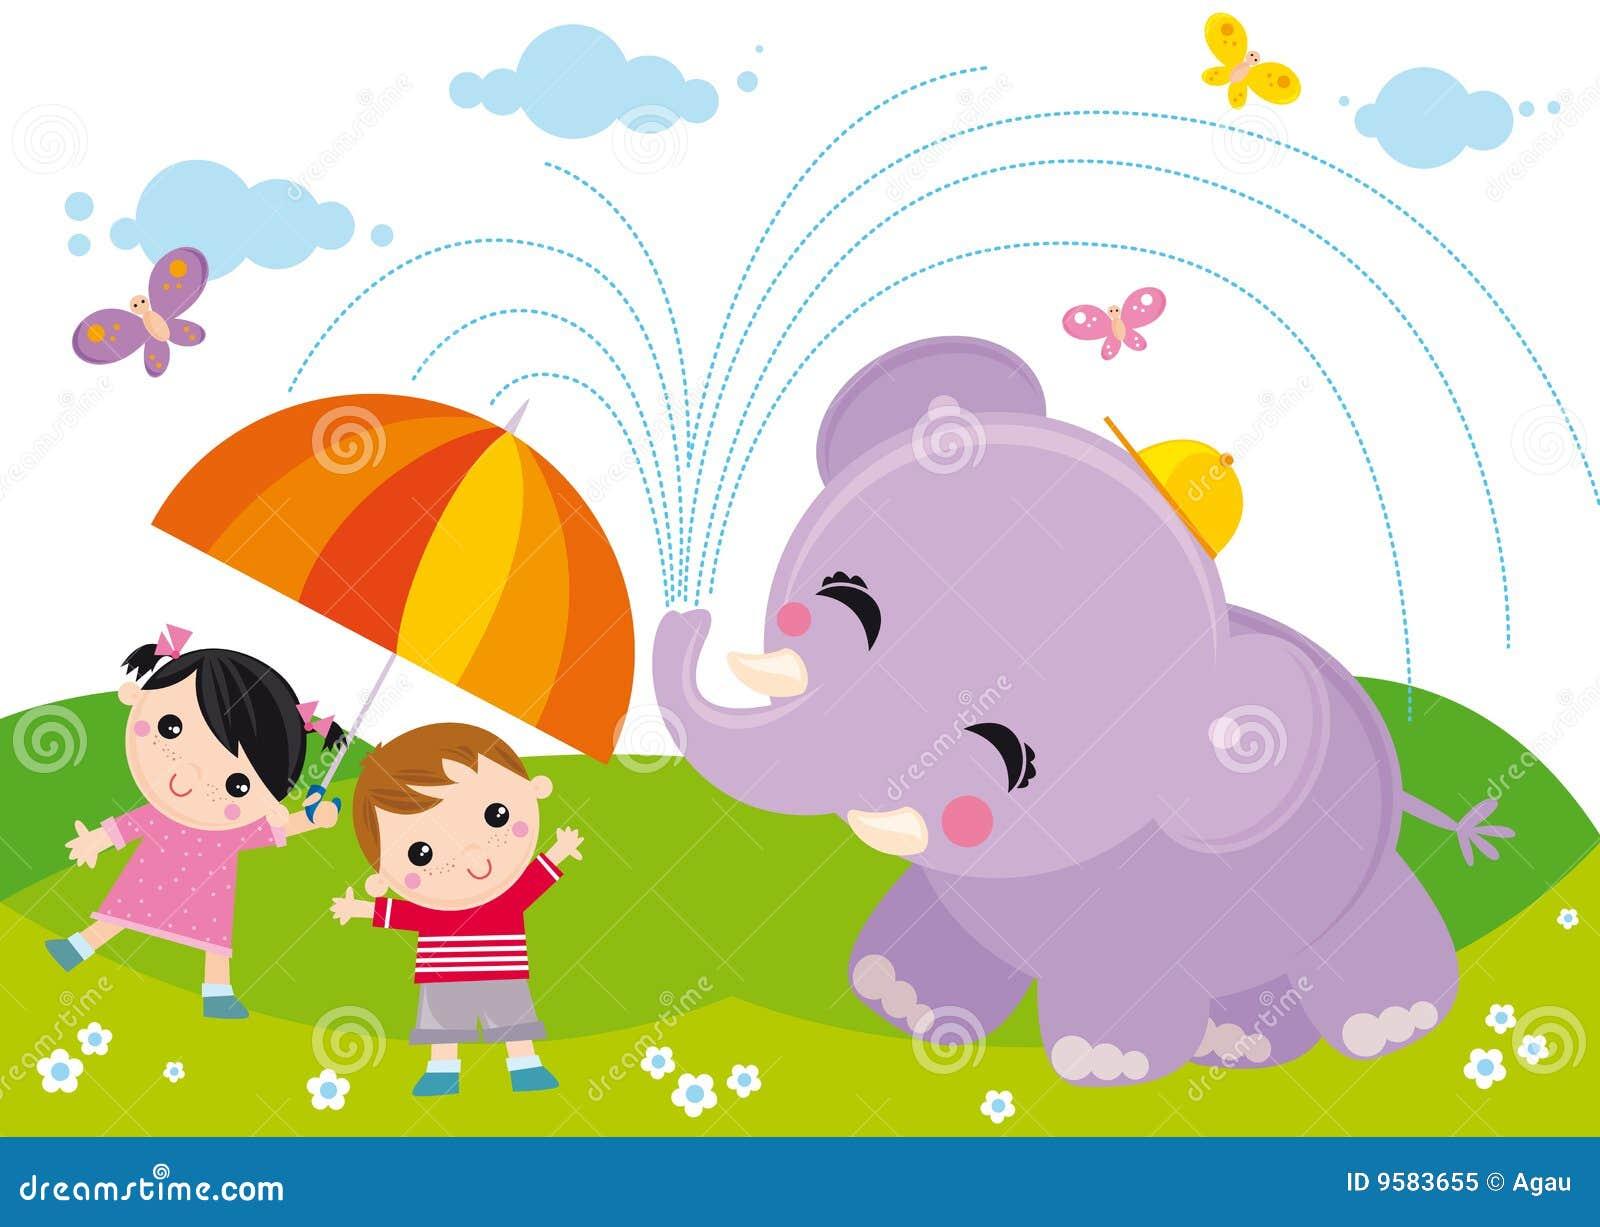 Kids And Elephant Royalty Free Stock Photo - Image: 9583655